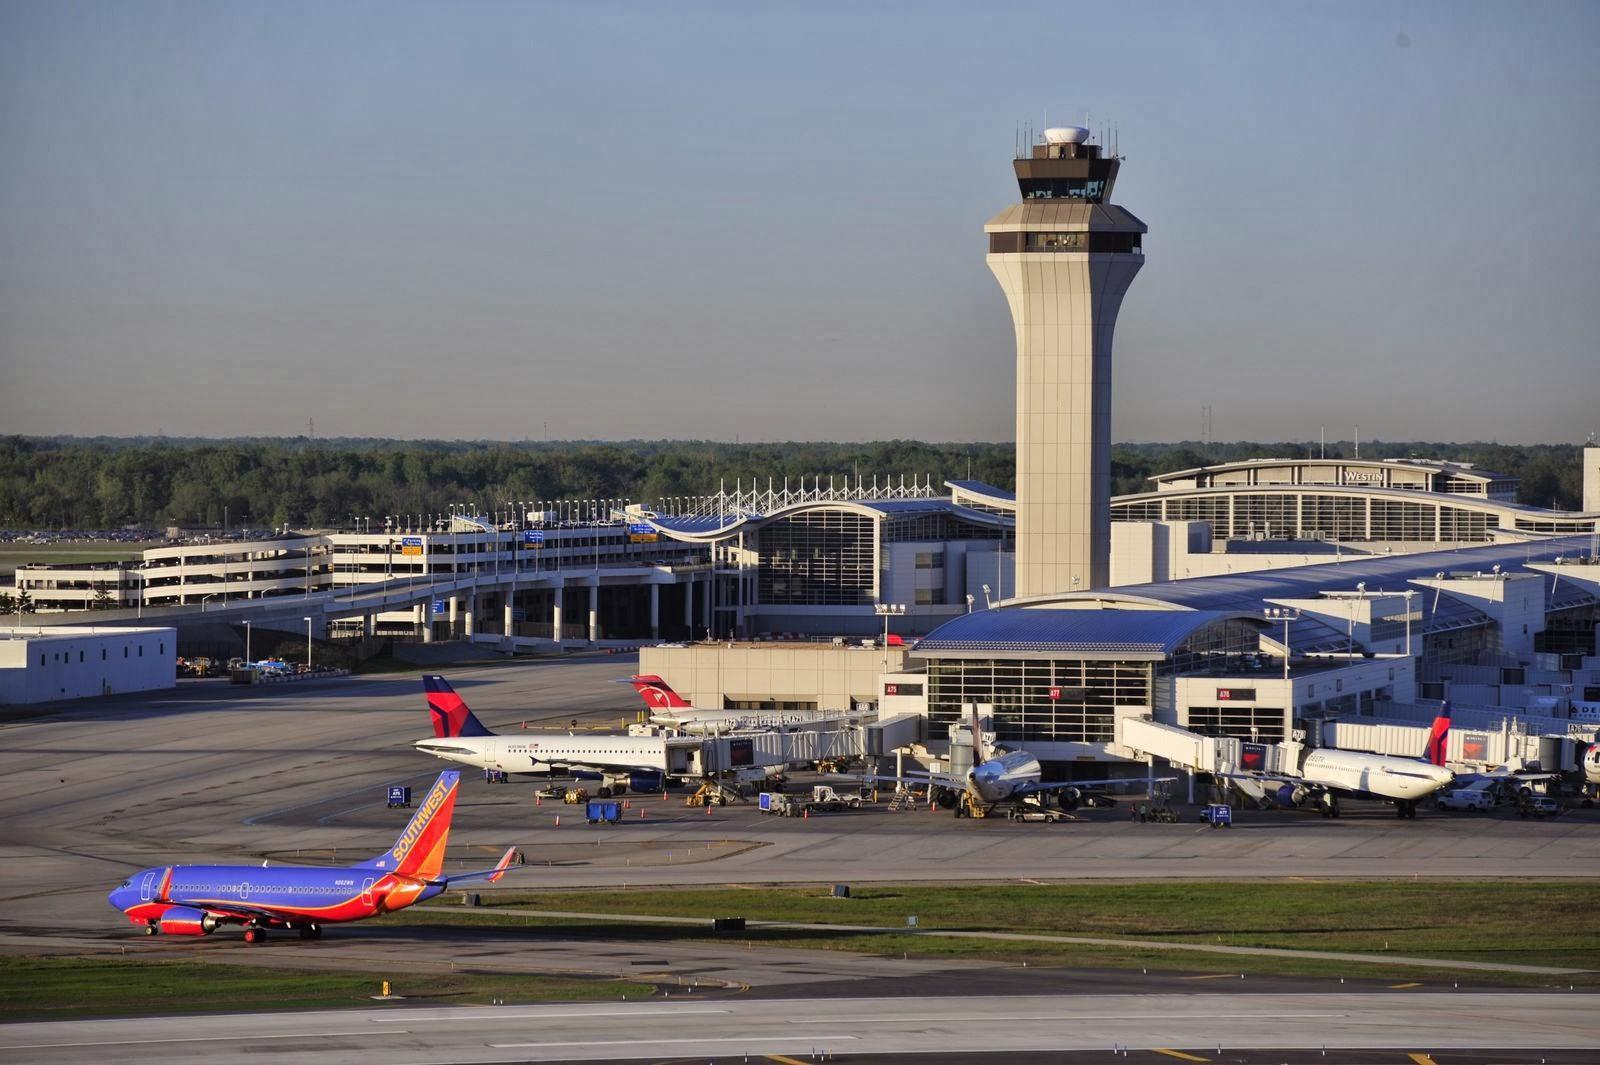 Aeropuerto De Detroit Aeropuerto Metropolitano De Detroit